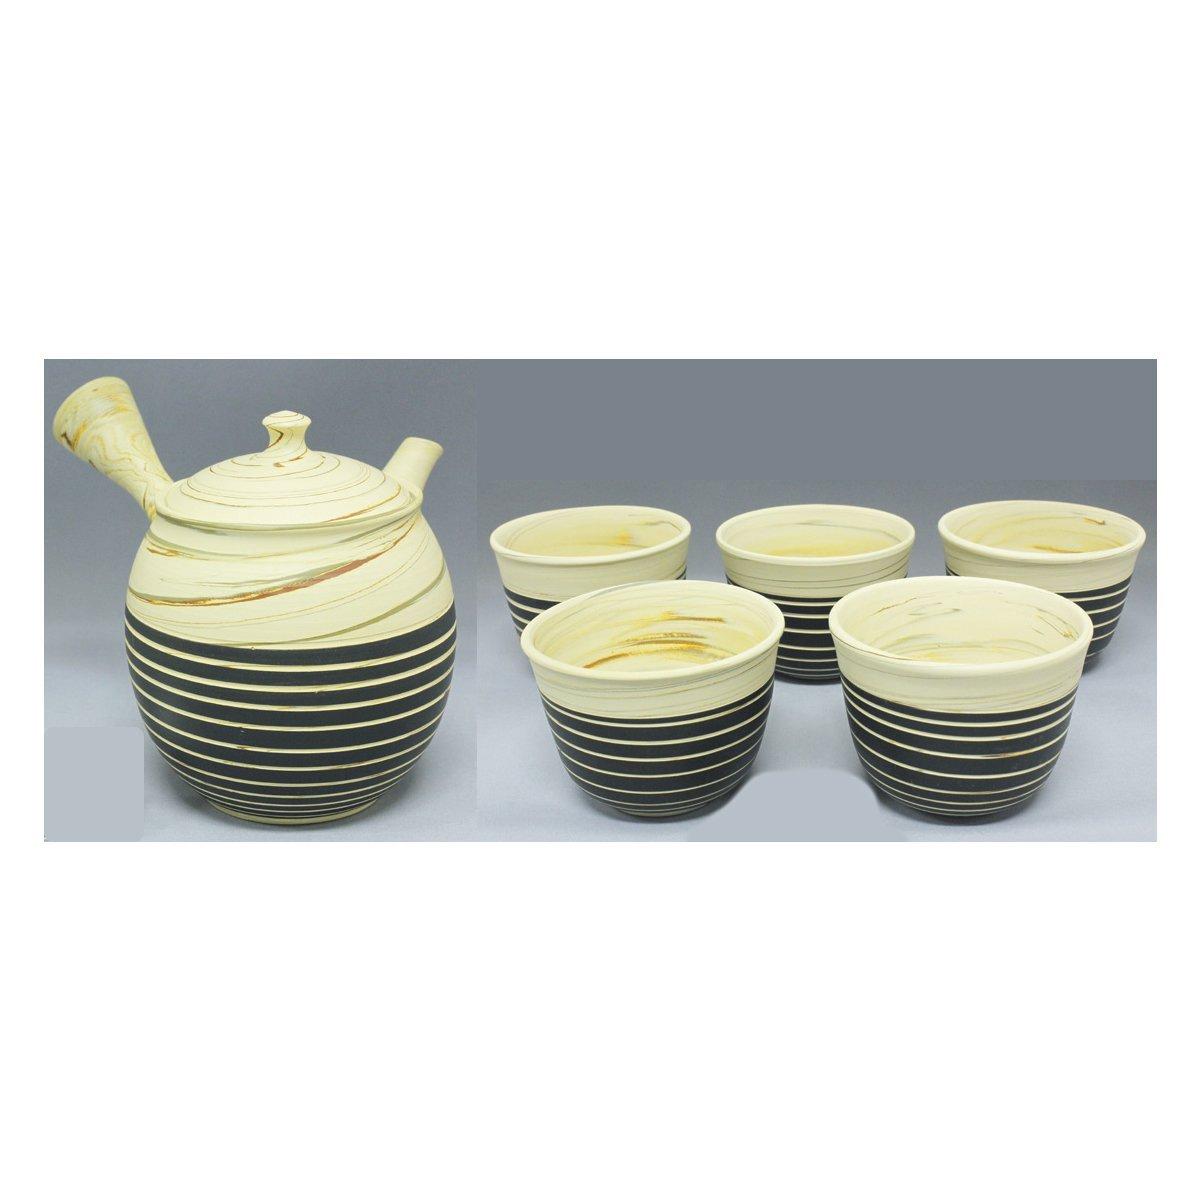 TOKYO MATCHA SELECTION - Tokoname Pottery Kyusu Teaset : KENJI - 1pot, 5yunom... - $272.24